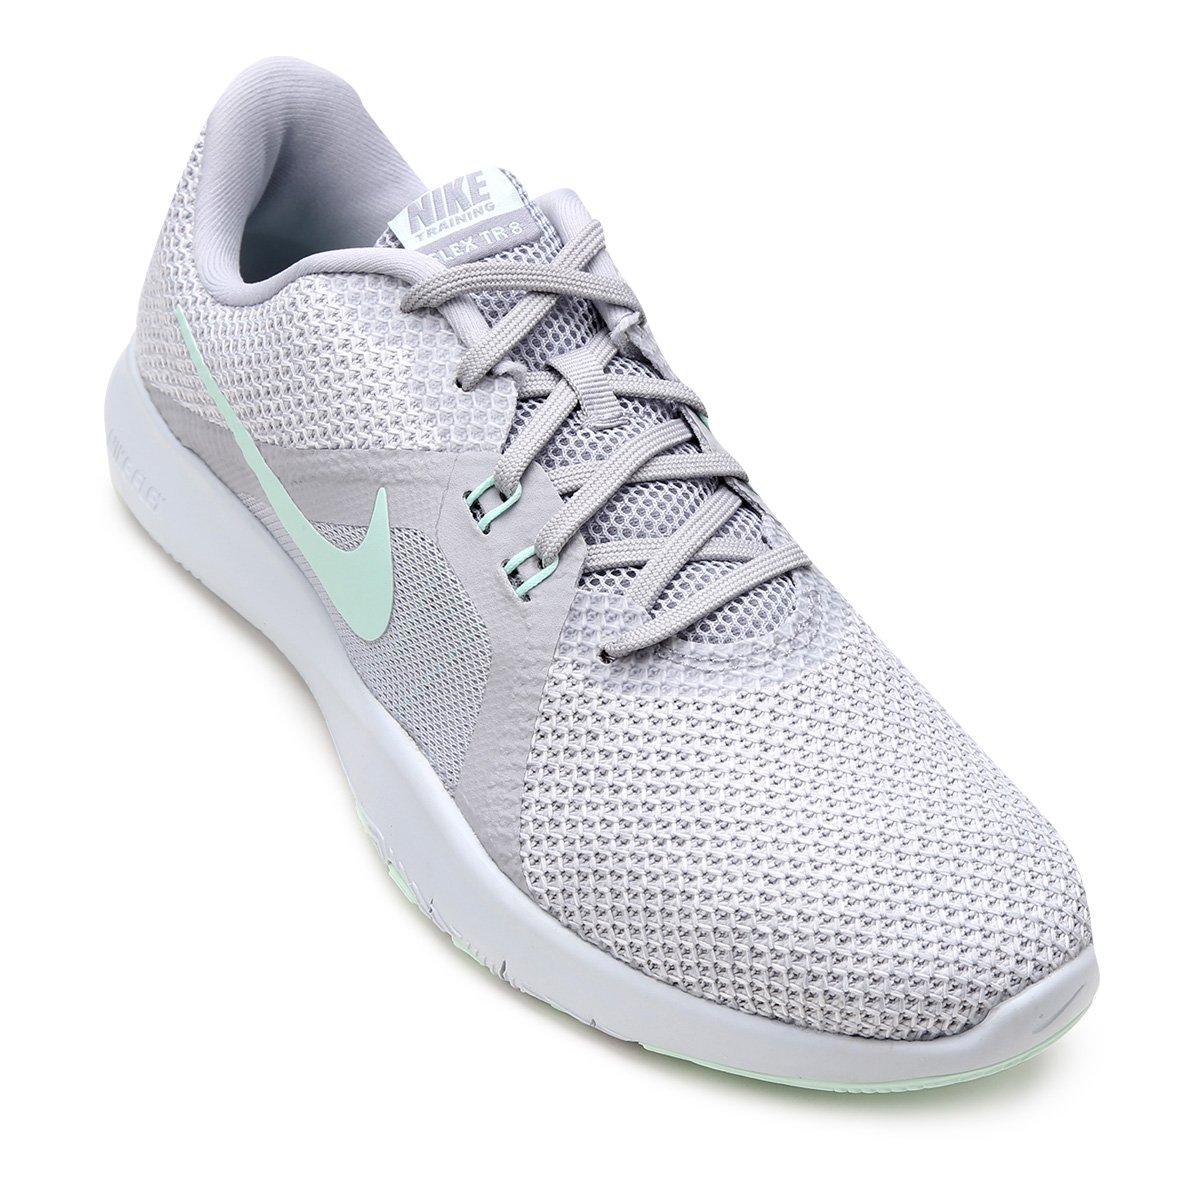 Tênis Nike Flex Trainer 8 Feminino Allianz Parque Shop